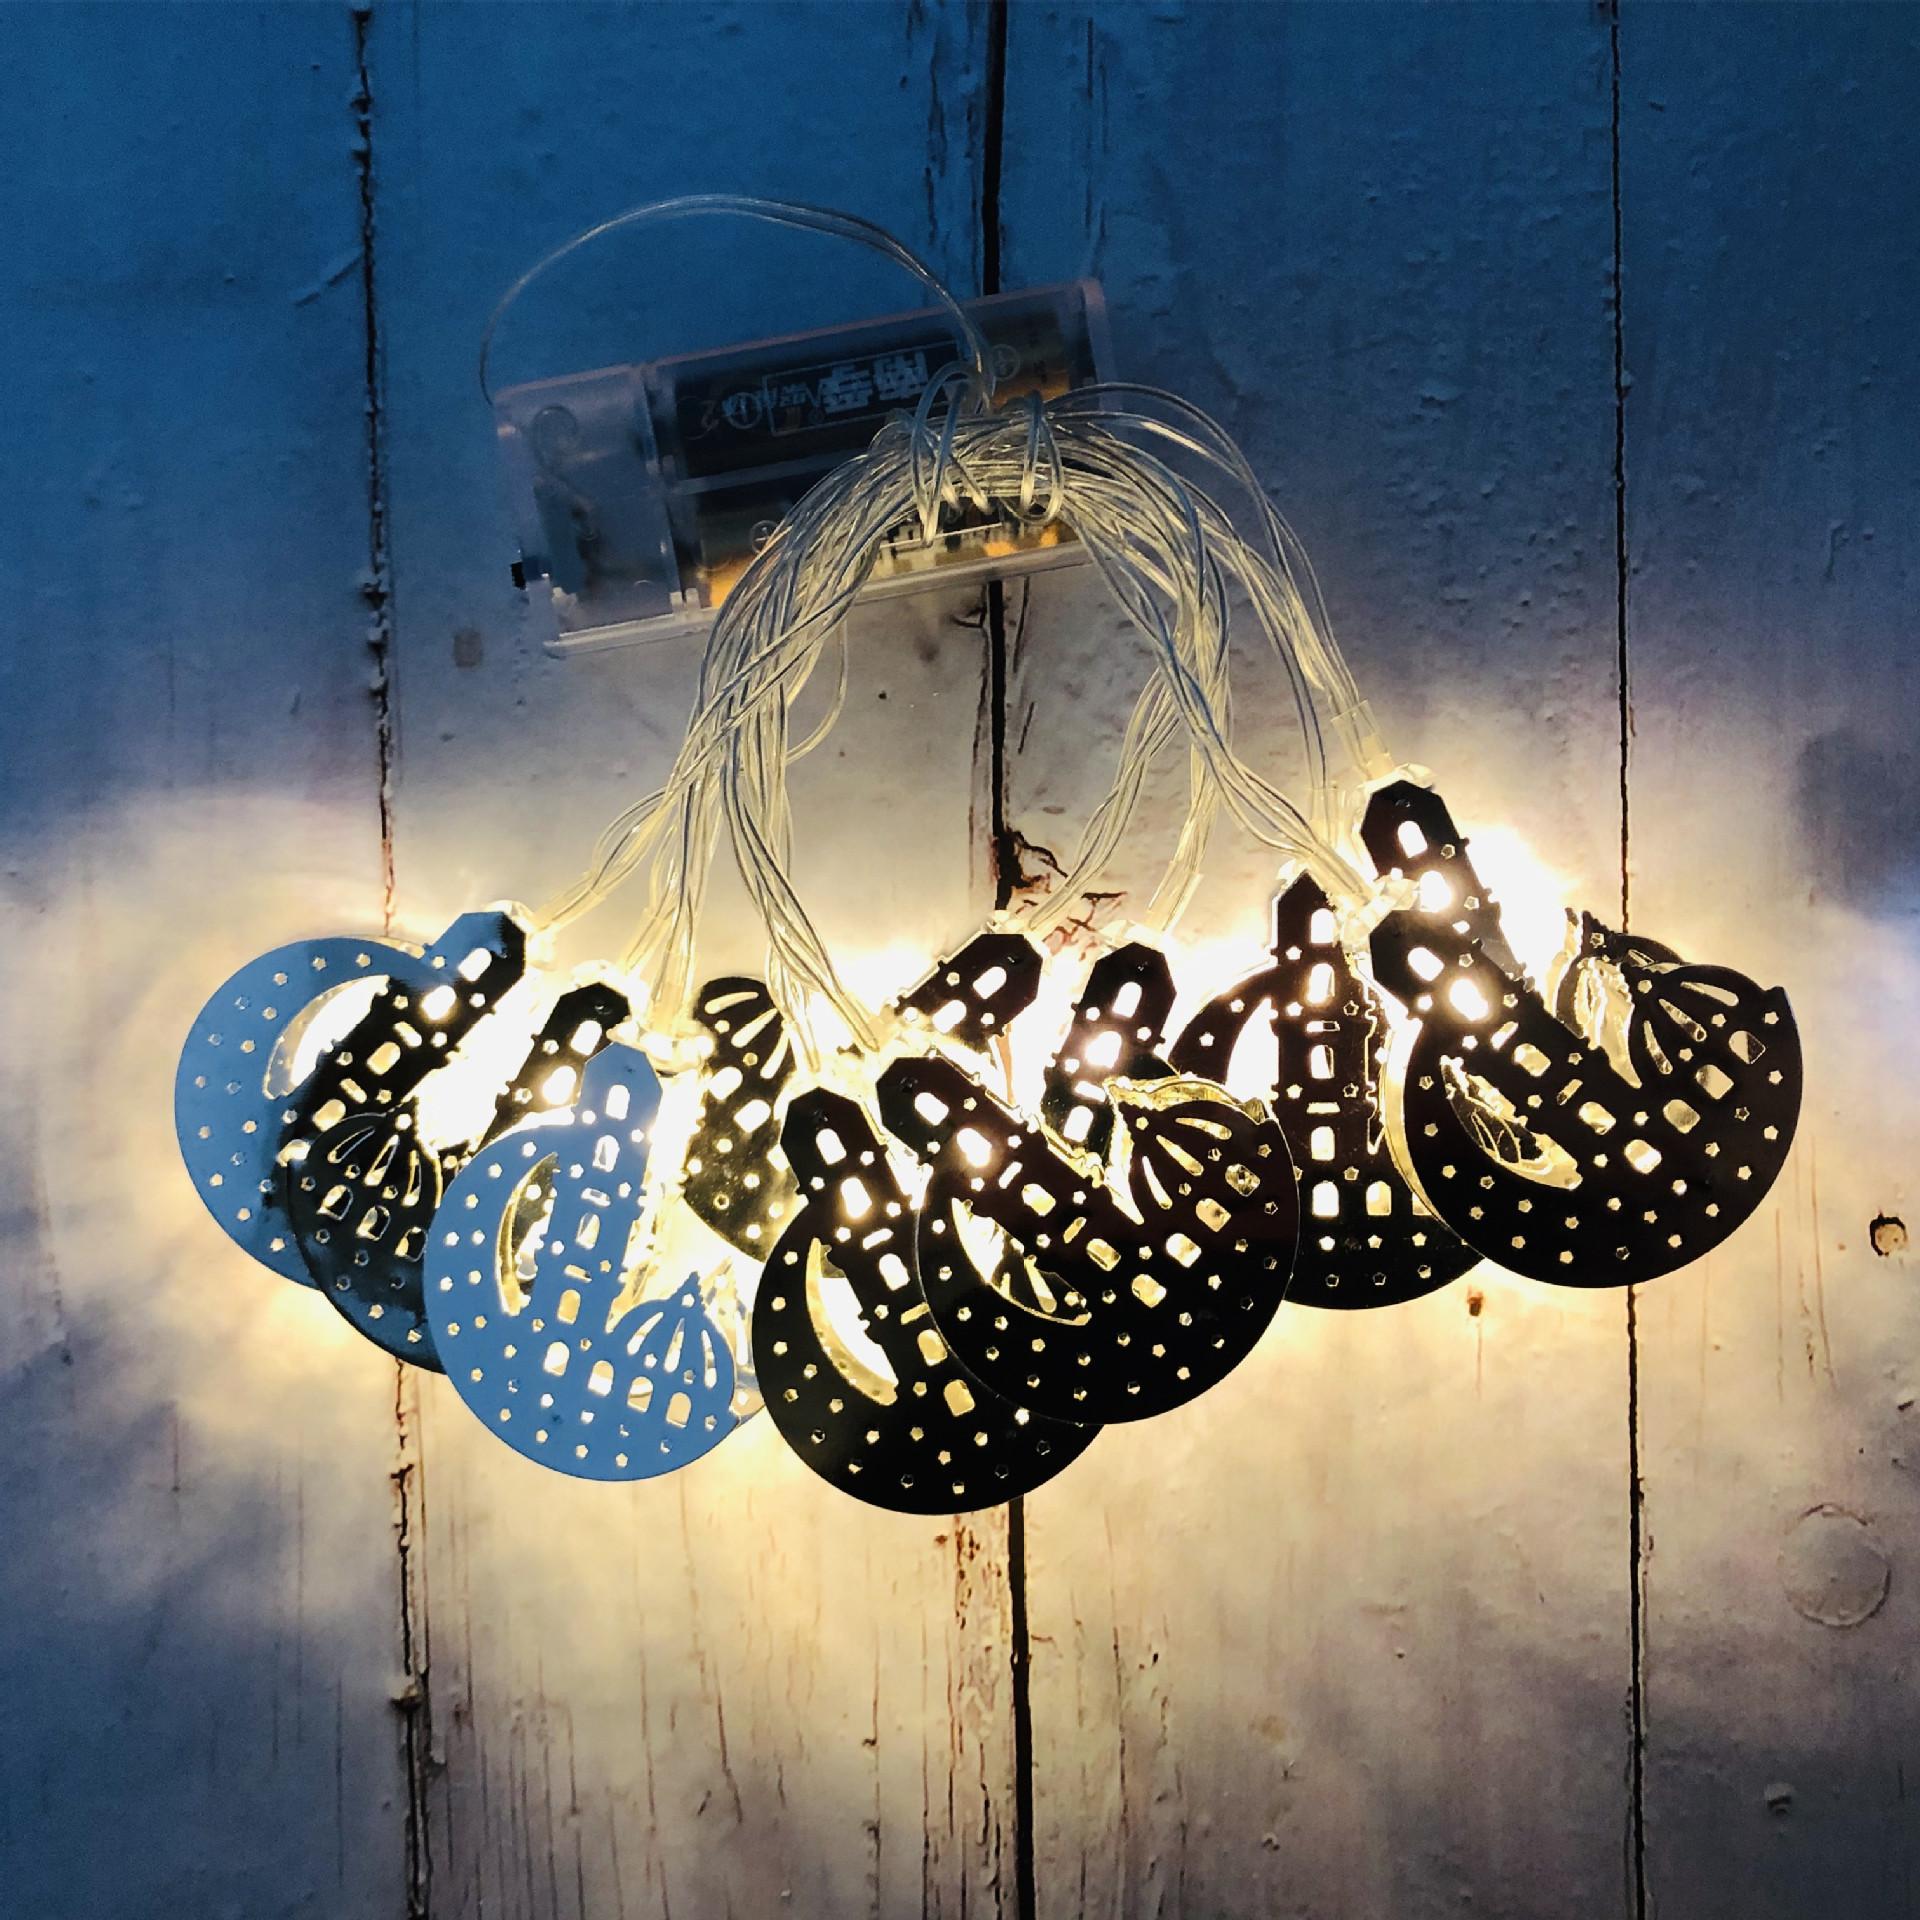 Eid Mubarak LED Wrought Iron Moon Castle Light String Ramadan Festival Garden Holiday Party Decoration Silver Moon Castle-Warm White